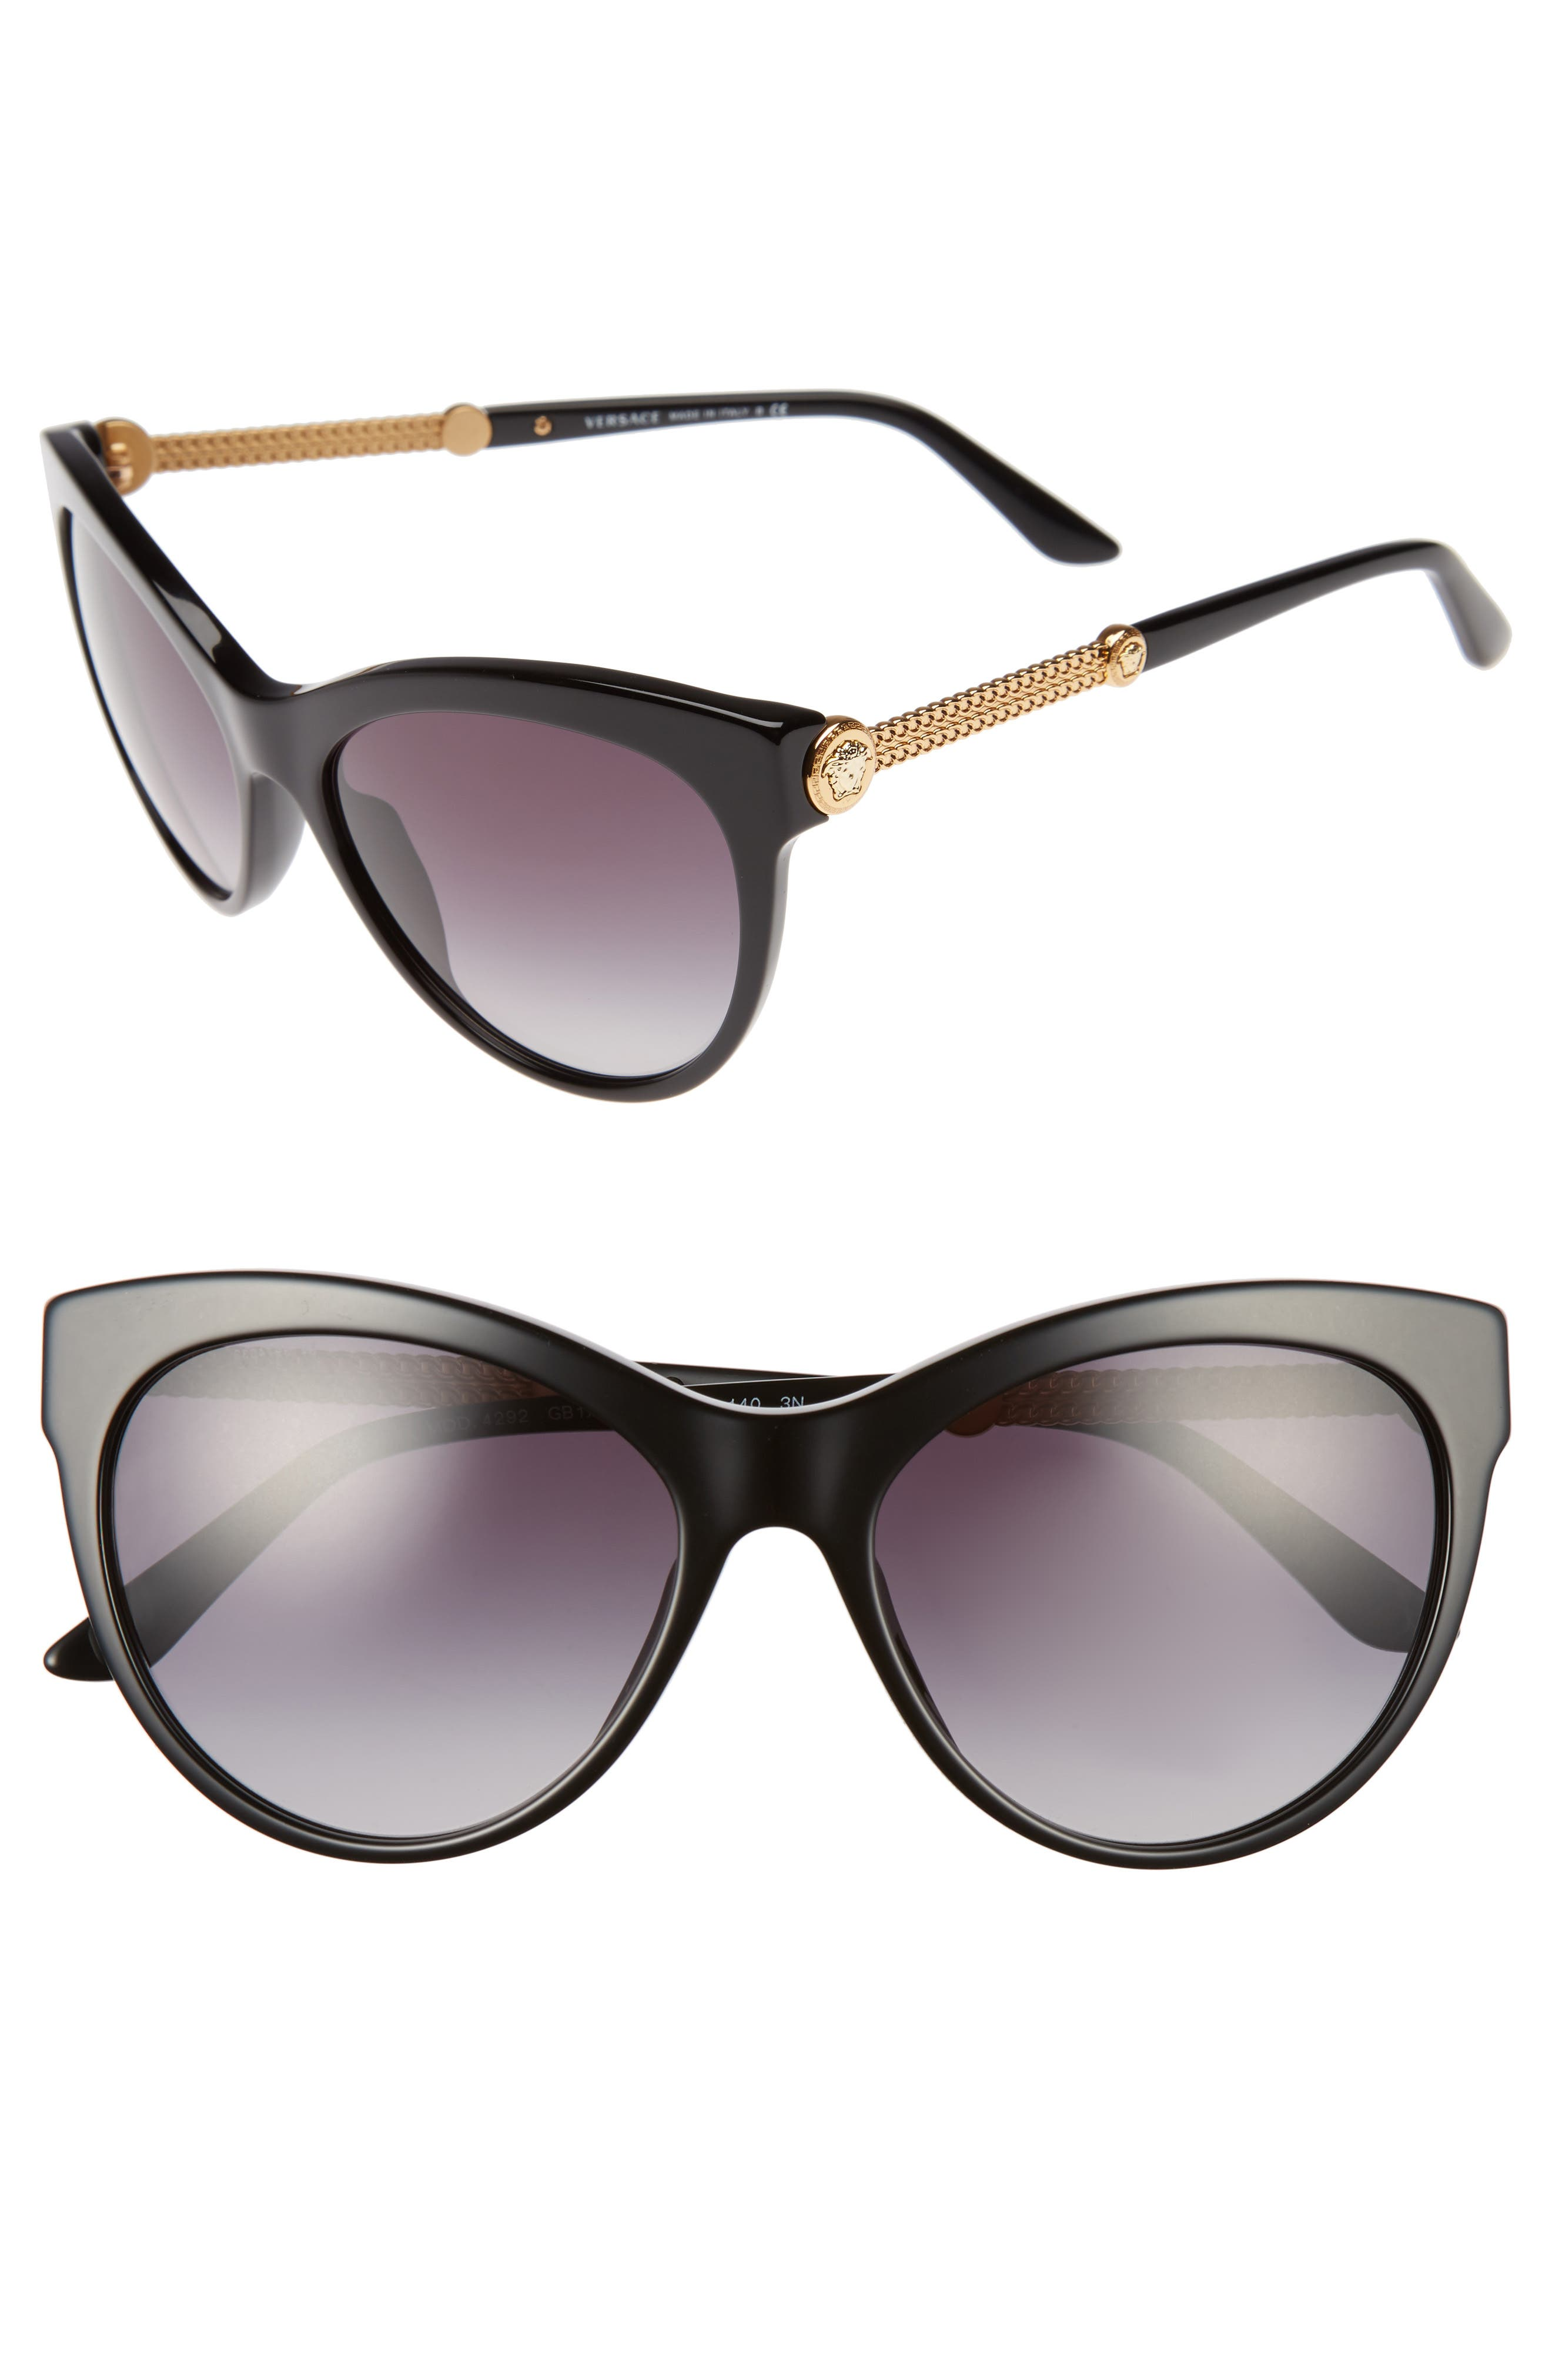 57mm Cat Eye Sunglasses,                         Main,                         color, 001